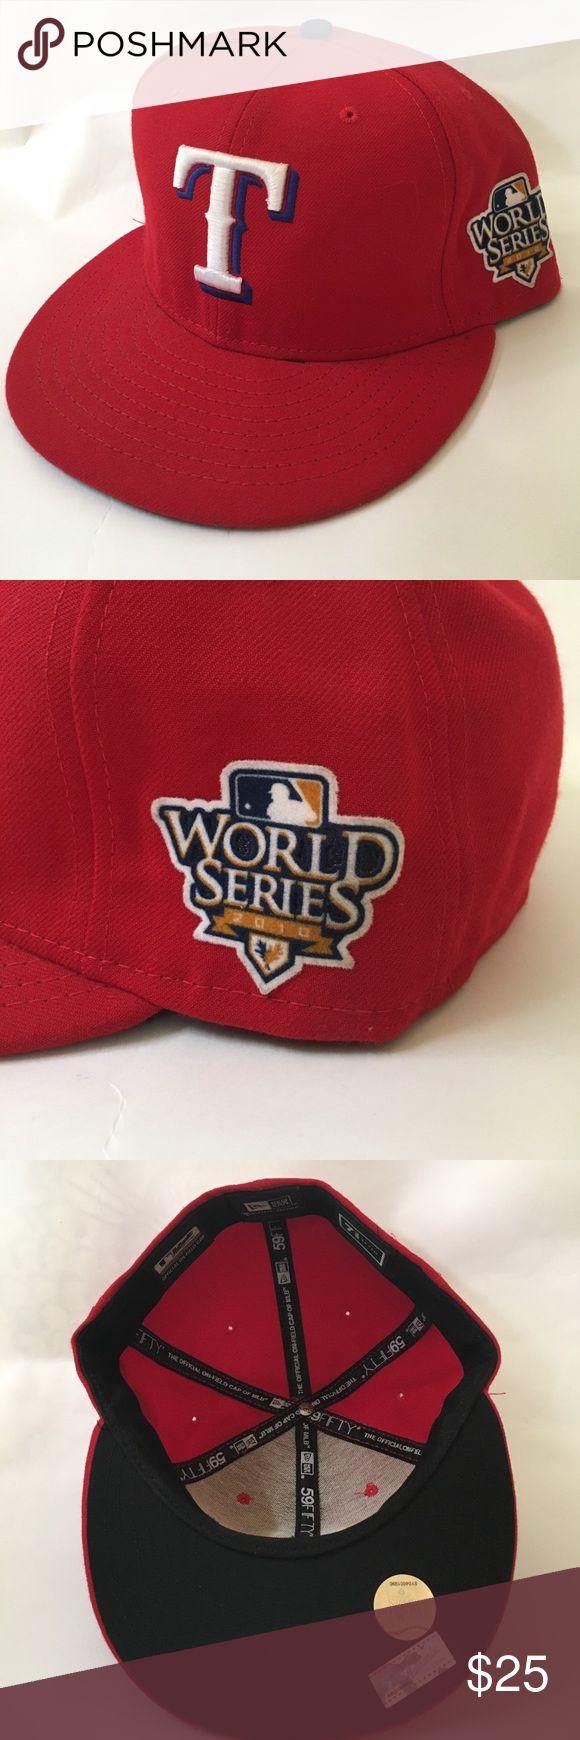 Texas Rangers World Series 2010 hat LIKE NEW! Texas Rangers 2010 World Series patch New Era fitted New Era Accessories Hats